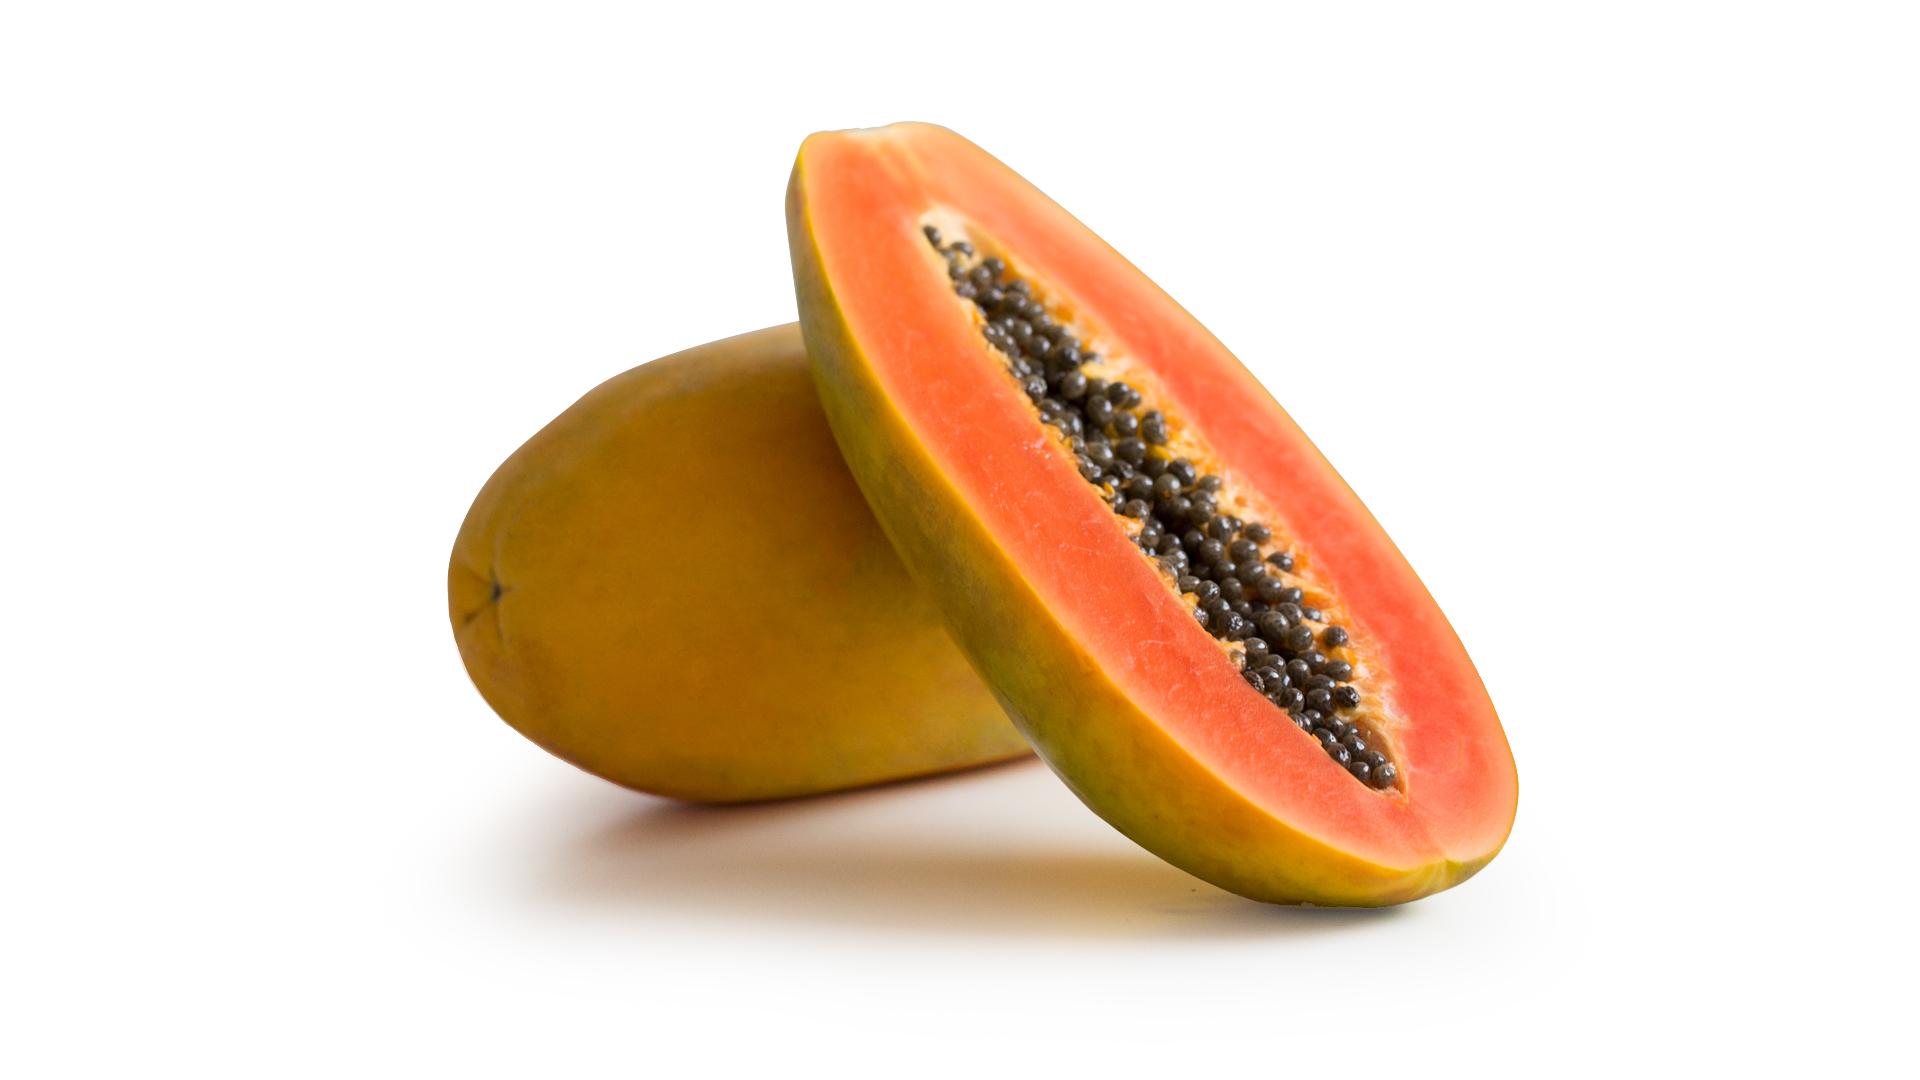 Papaya_Whole_1920x1080_2.jpg